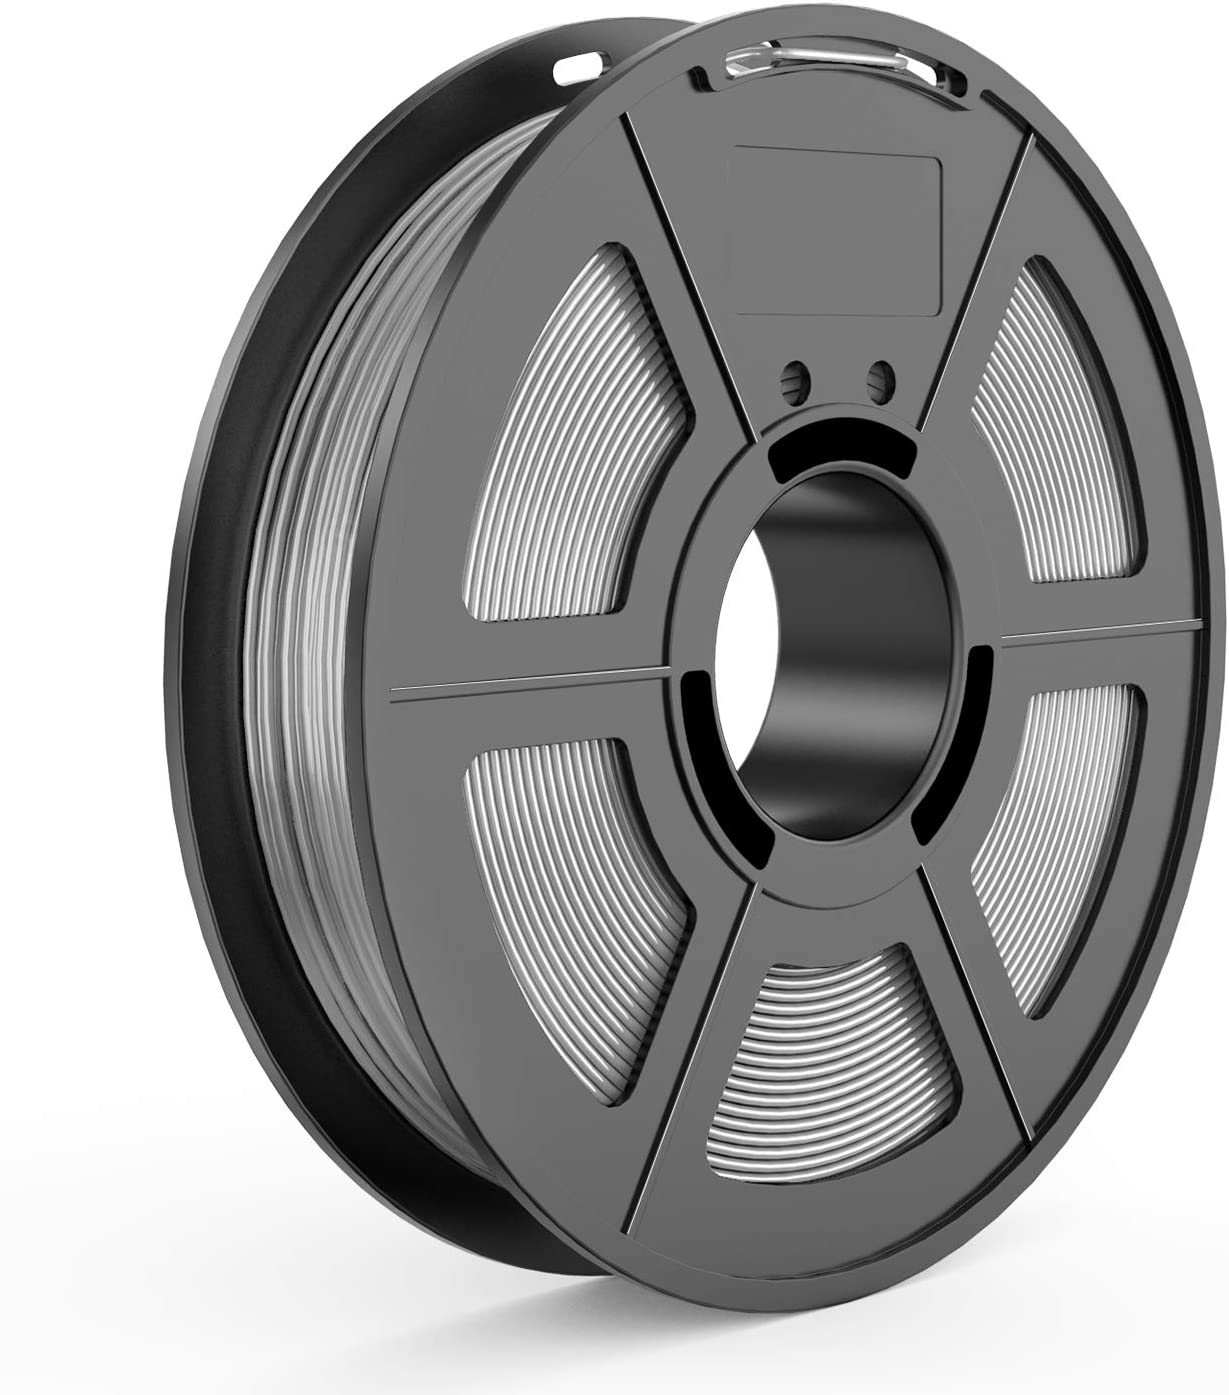 TECBEARS TPU 3D Printer Filament 1.75mm Gray, 95A Shore Hardness, Dimensional Accuracy +/- 0.03 mm, 0.5 Kg Spool, Pack of 1